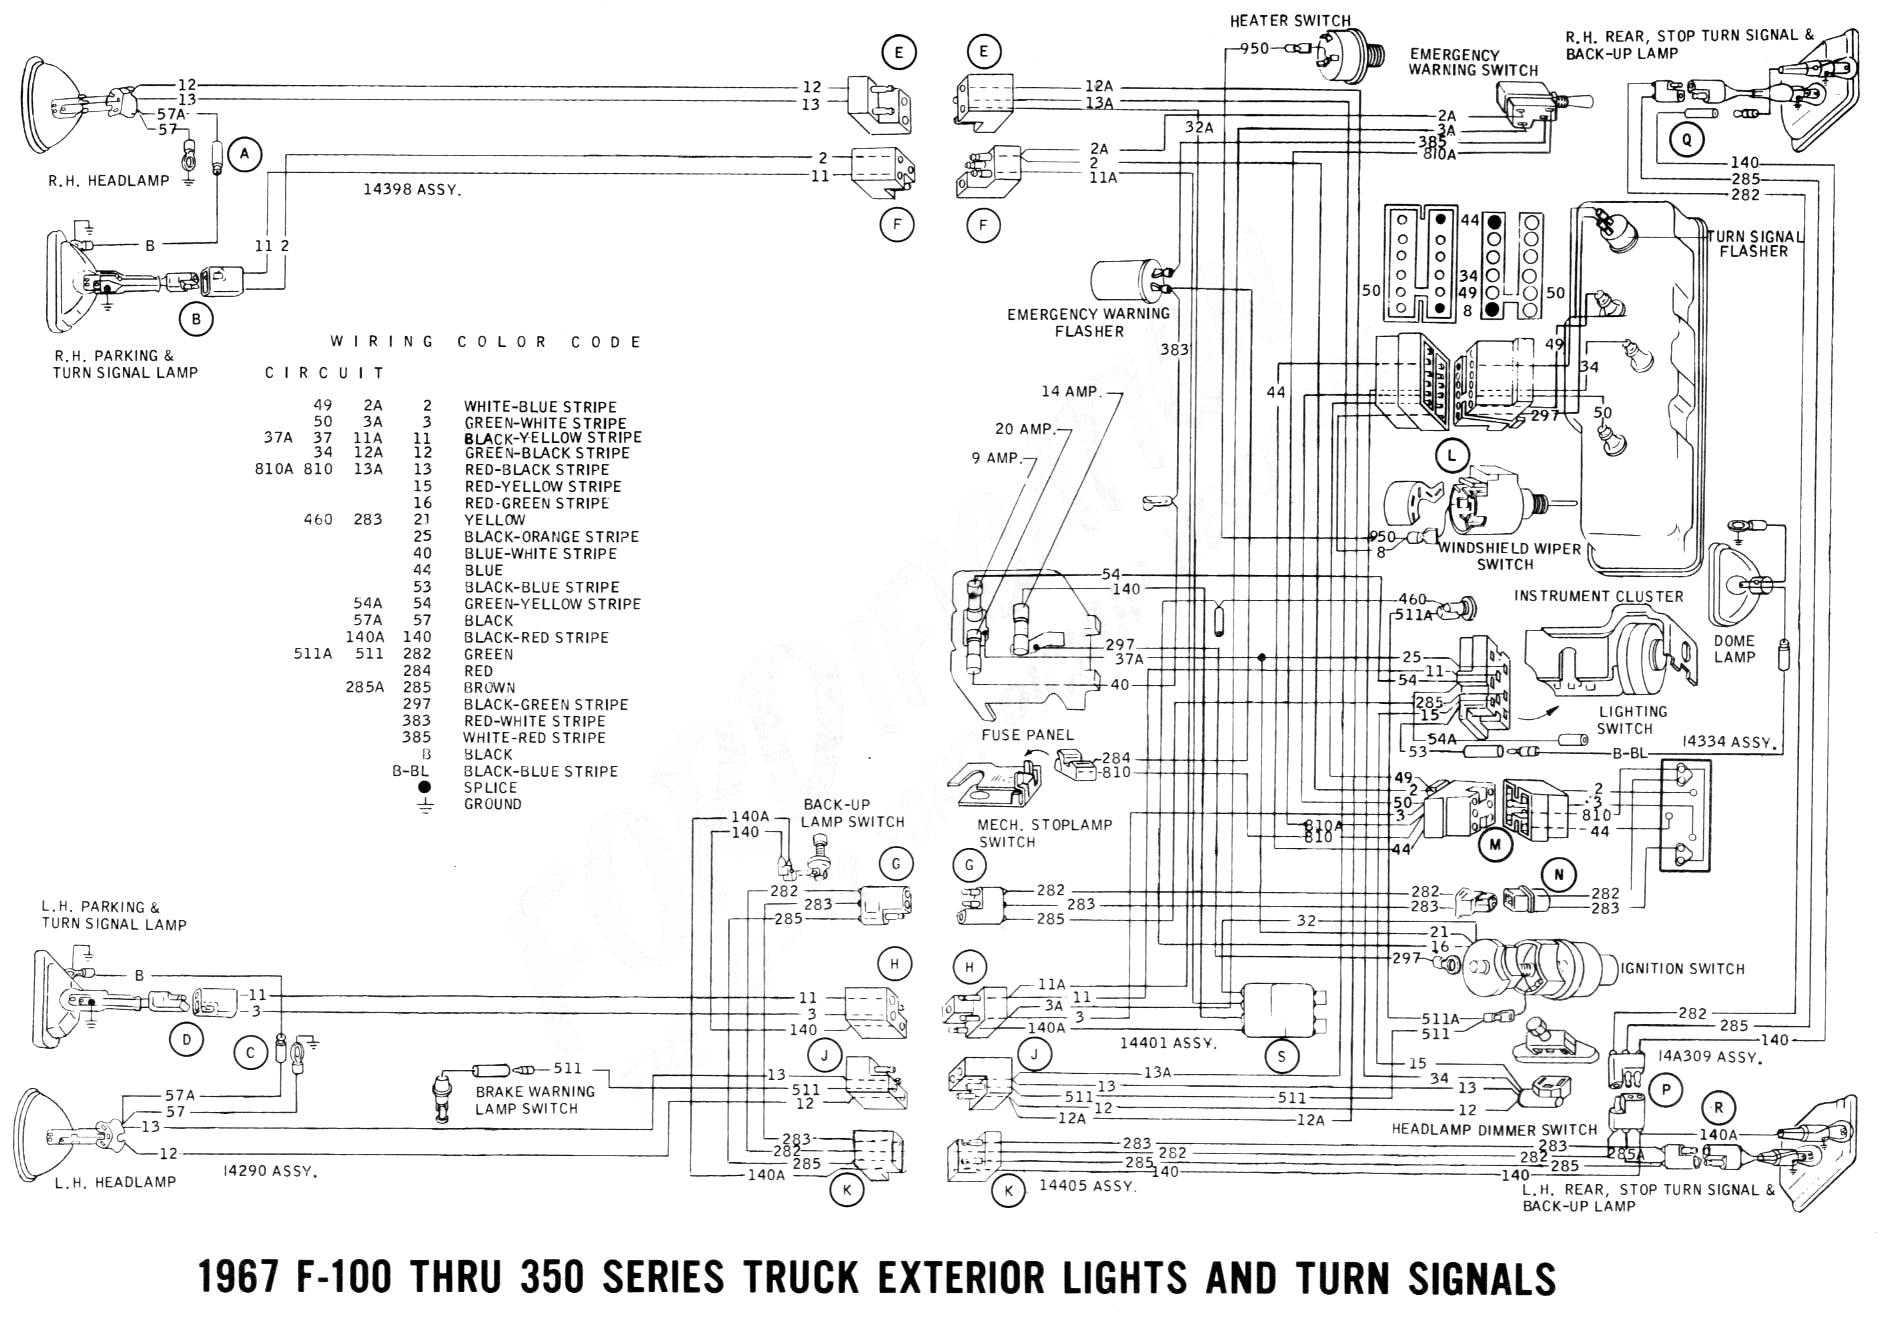 2005 Ford F750 Wiring Diagram | favor-bike Wiring Diagram Word -  favor-bike.wizex.euwizex.eu